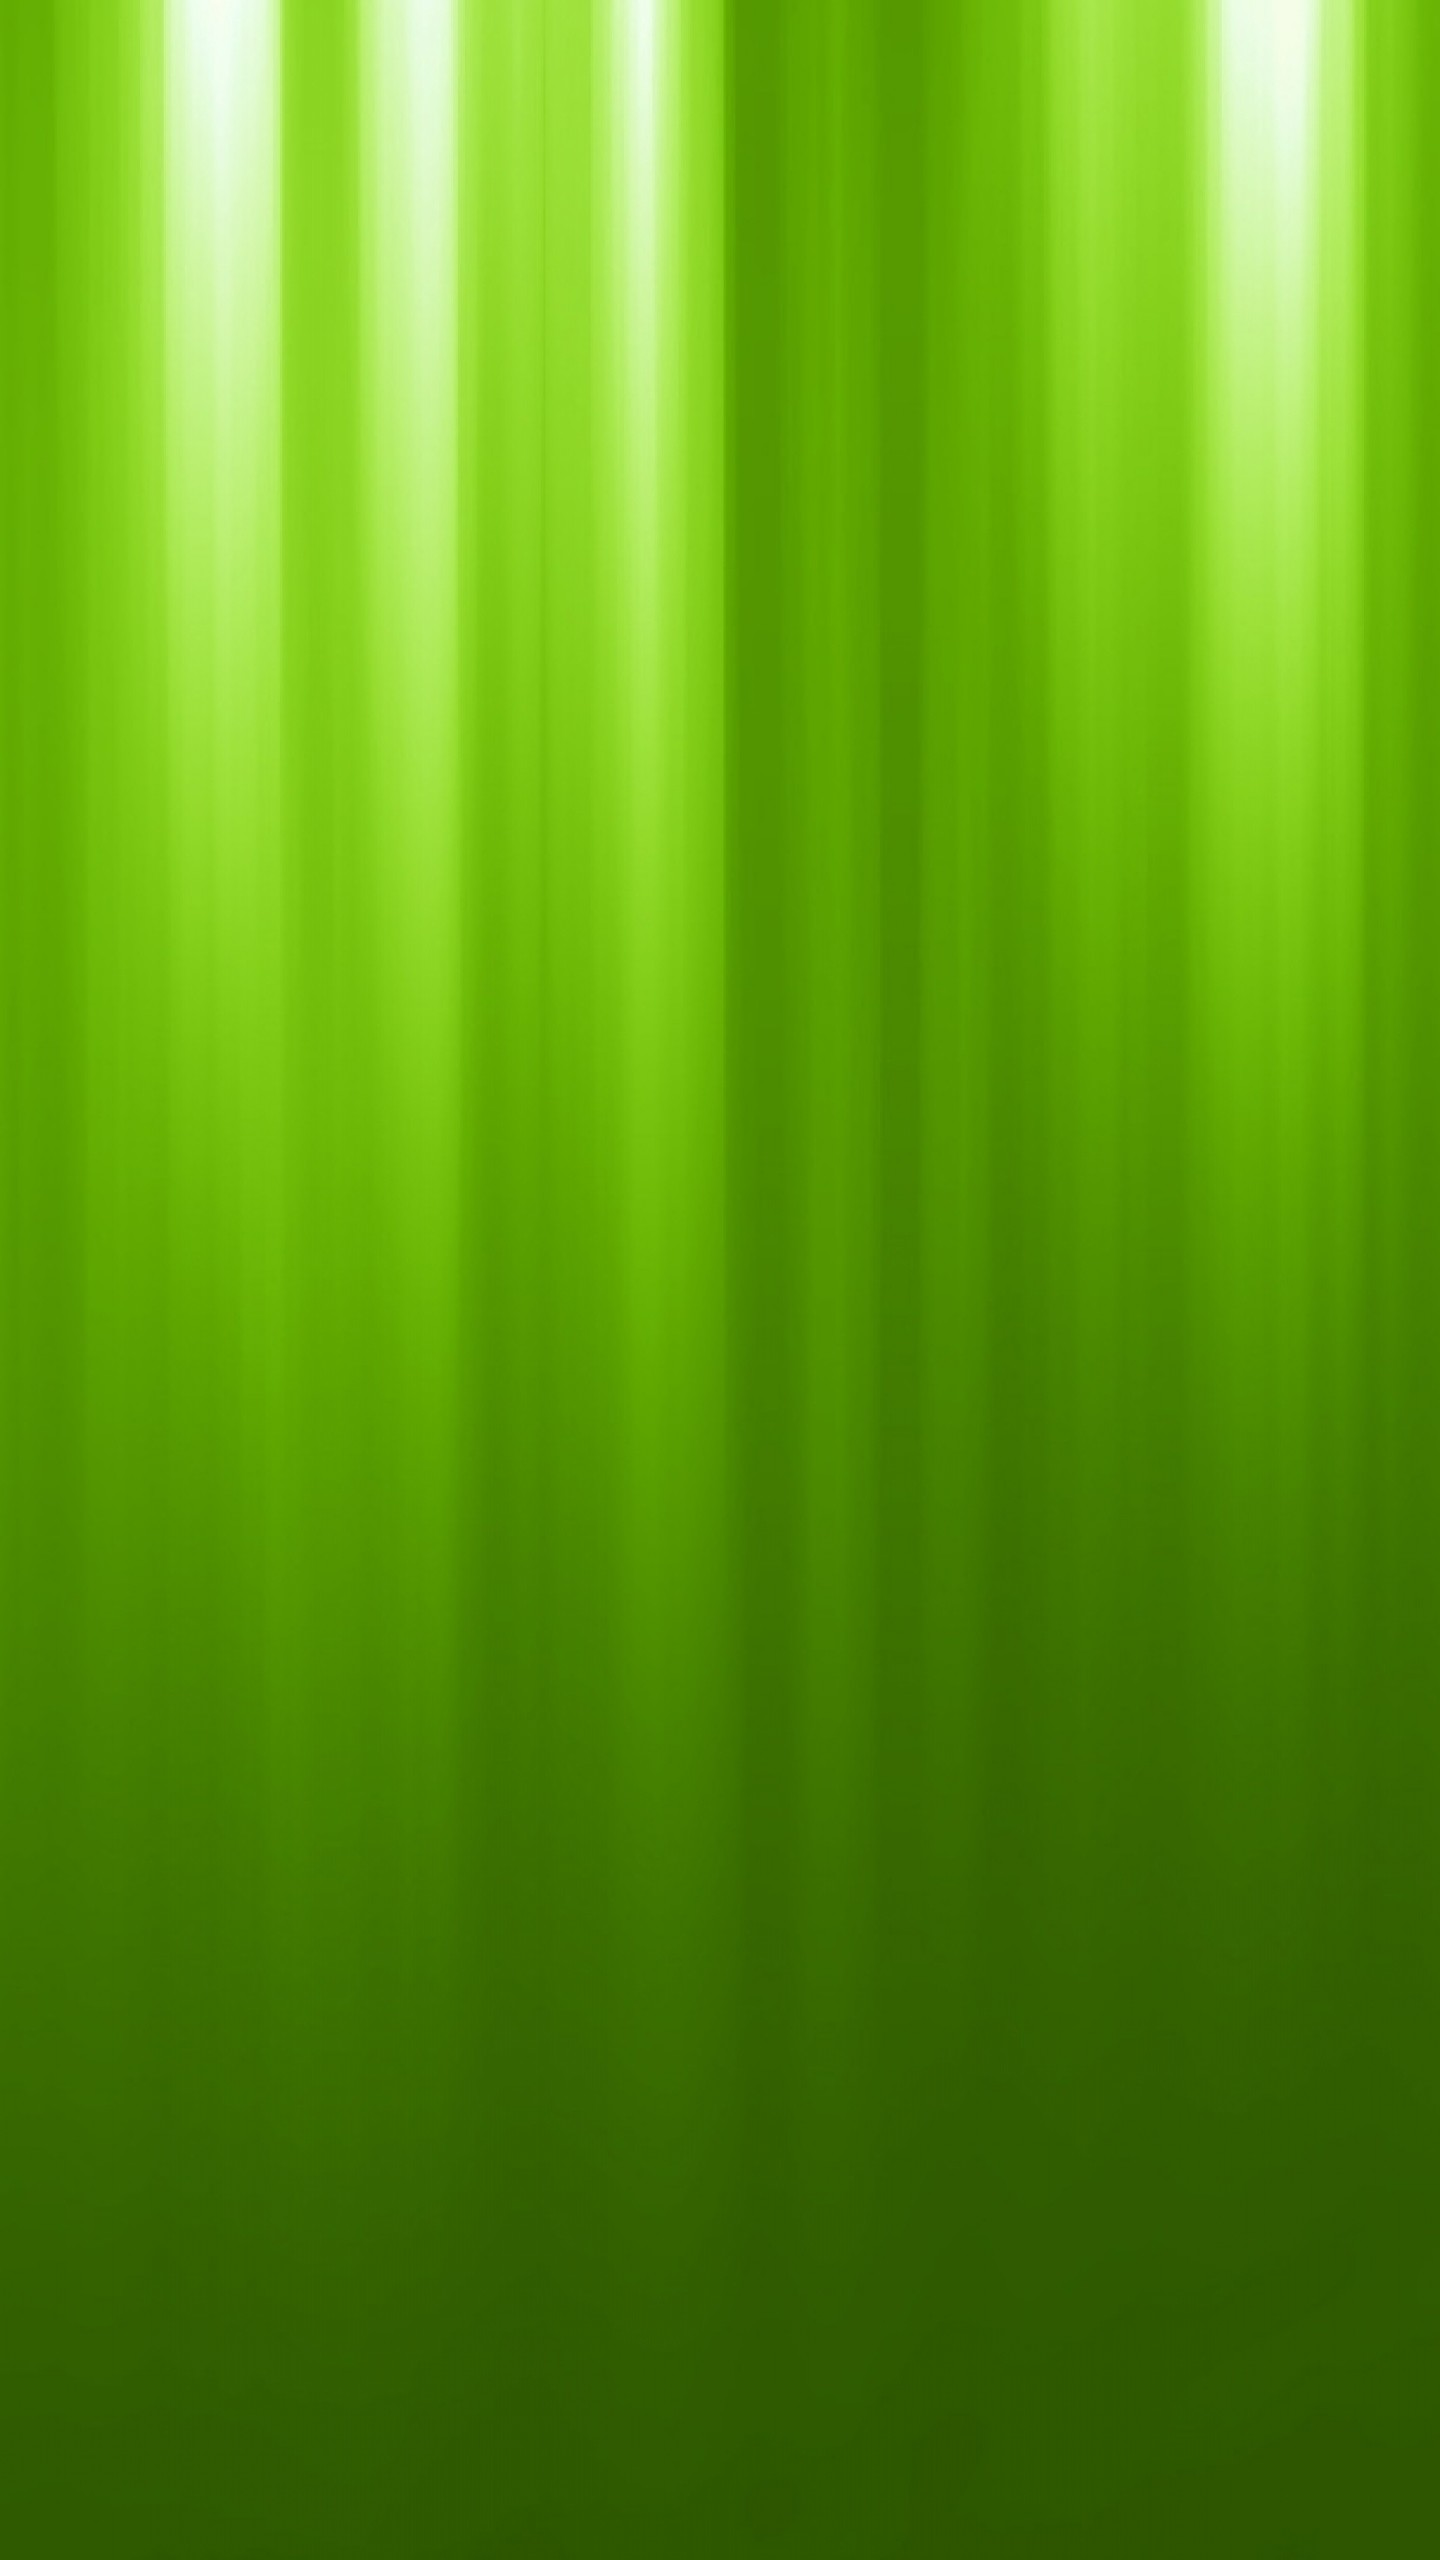 Wallpaper vertical, background, lines, stripes